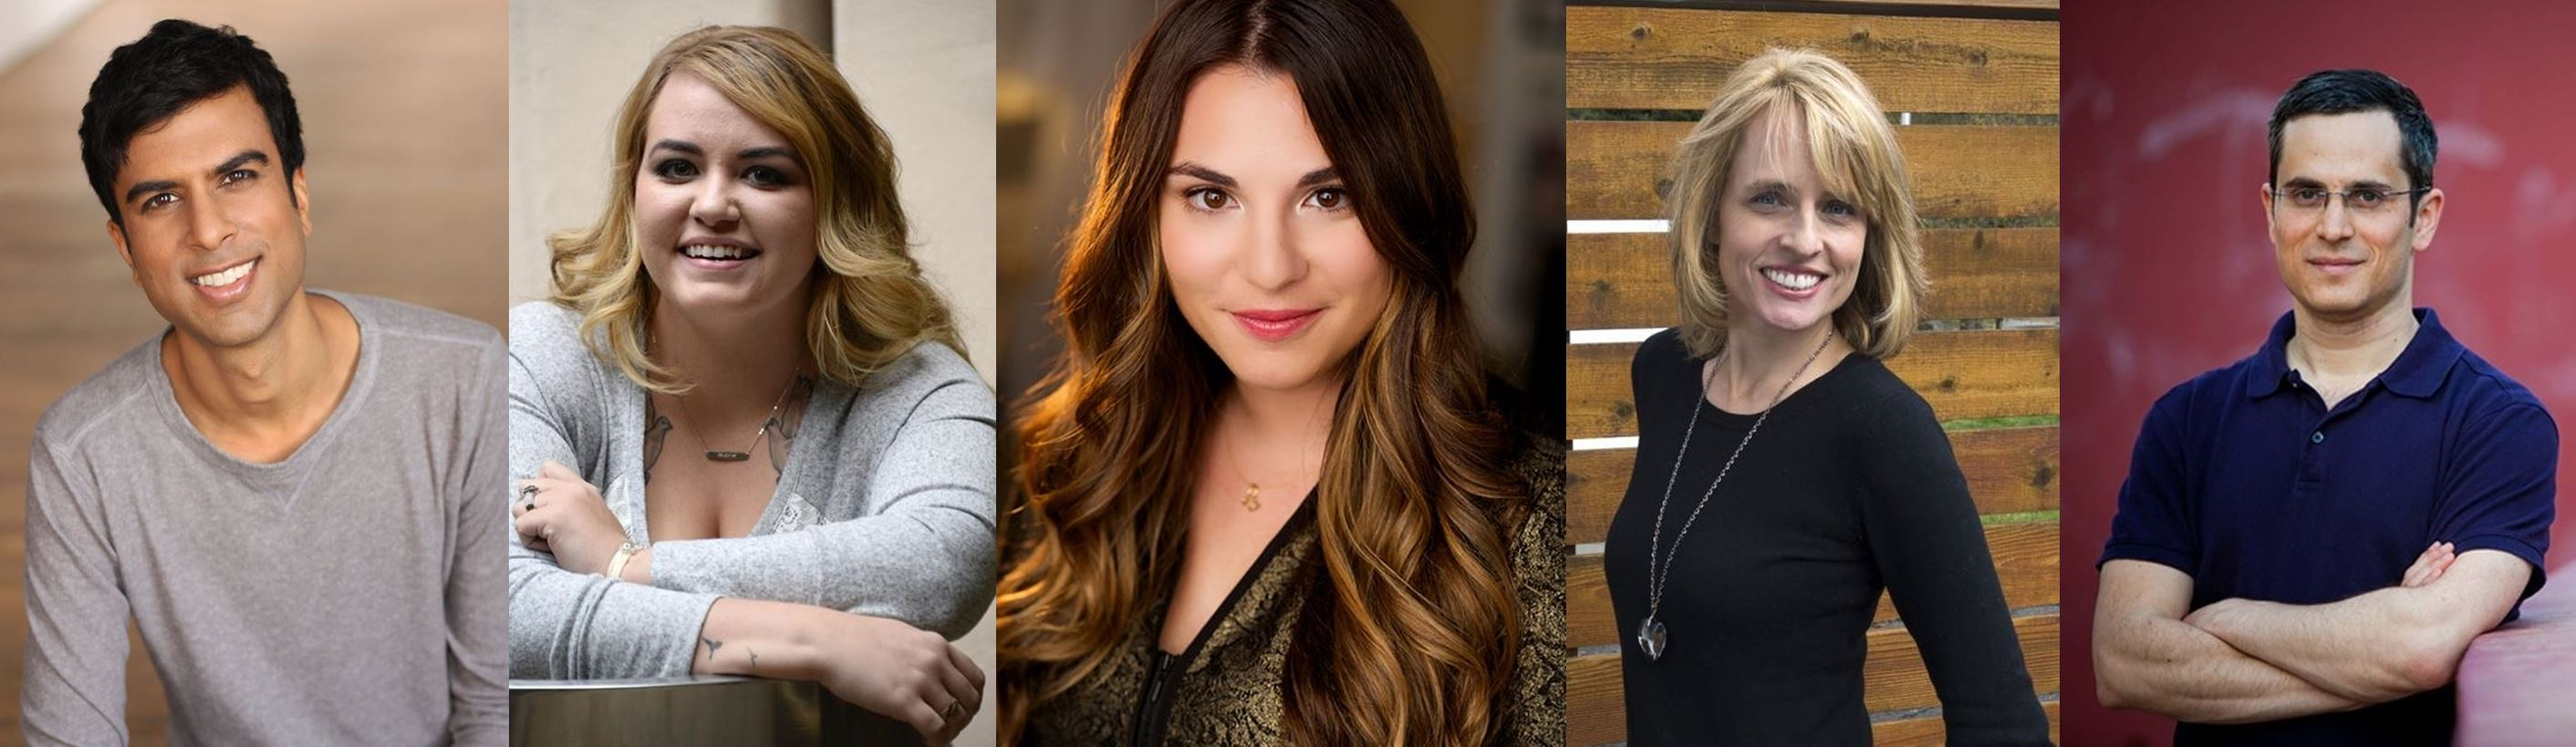 Victoria Aveyard, Anna Todd, Soman Chainani, Yoav Blum e Lauren Blakely confirmados na Bienal do Livro de São Paulo